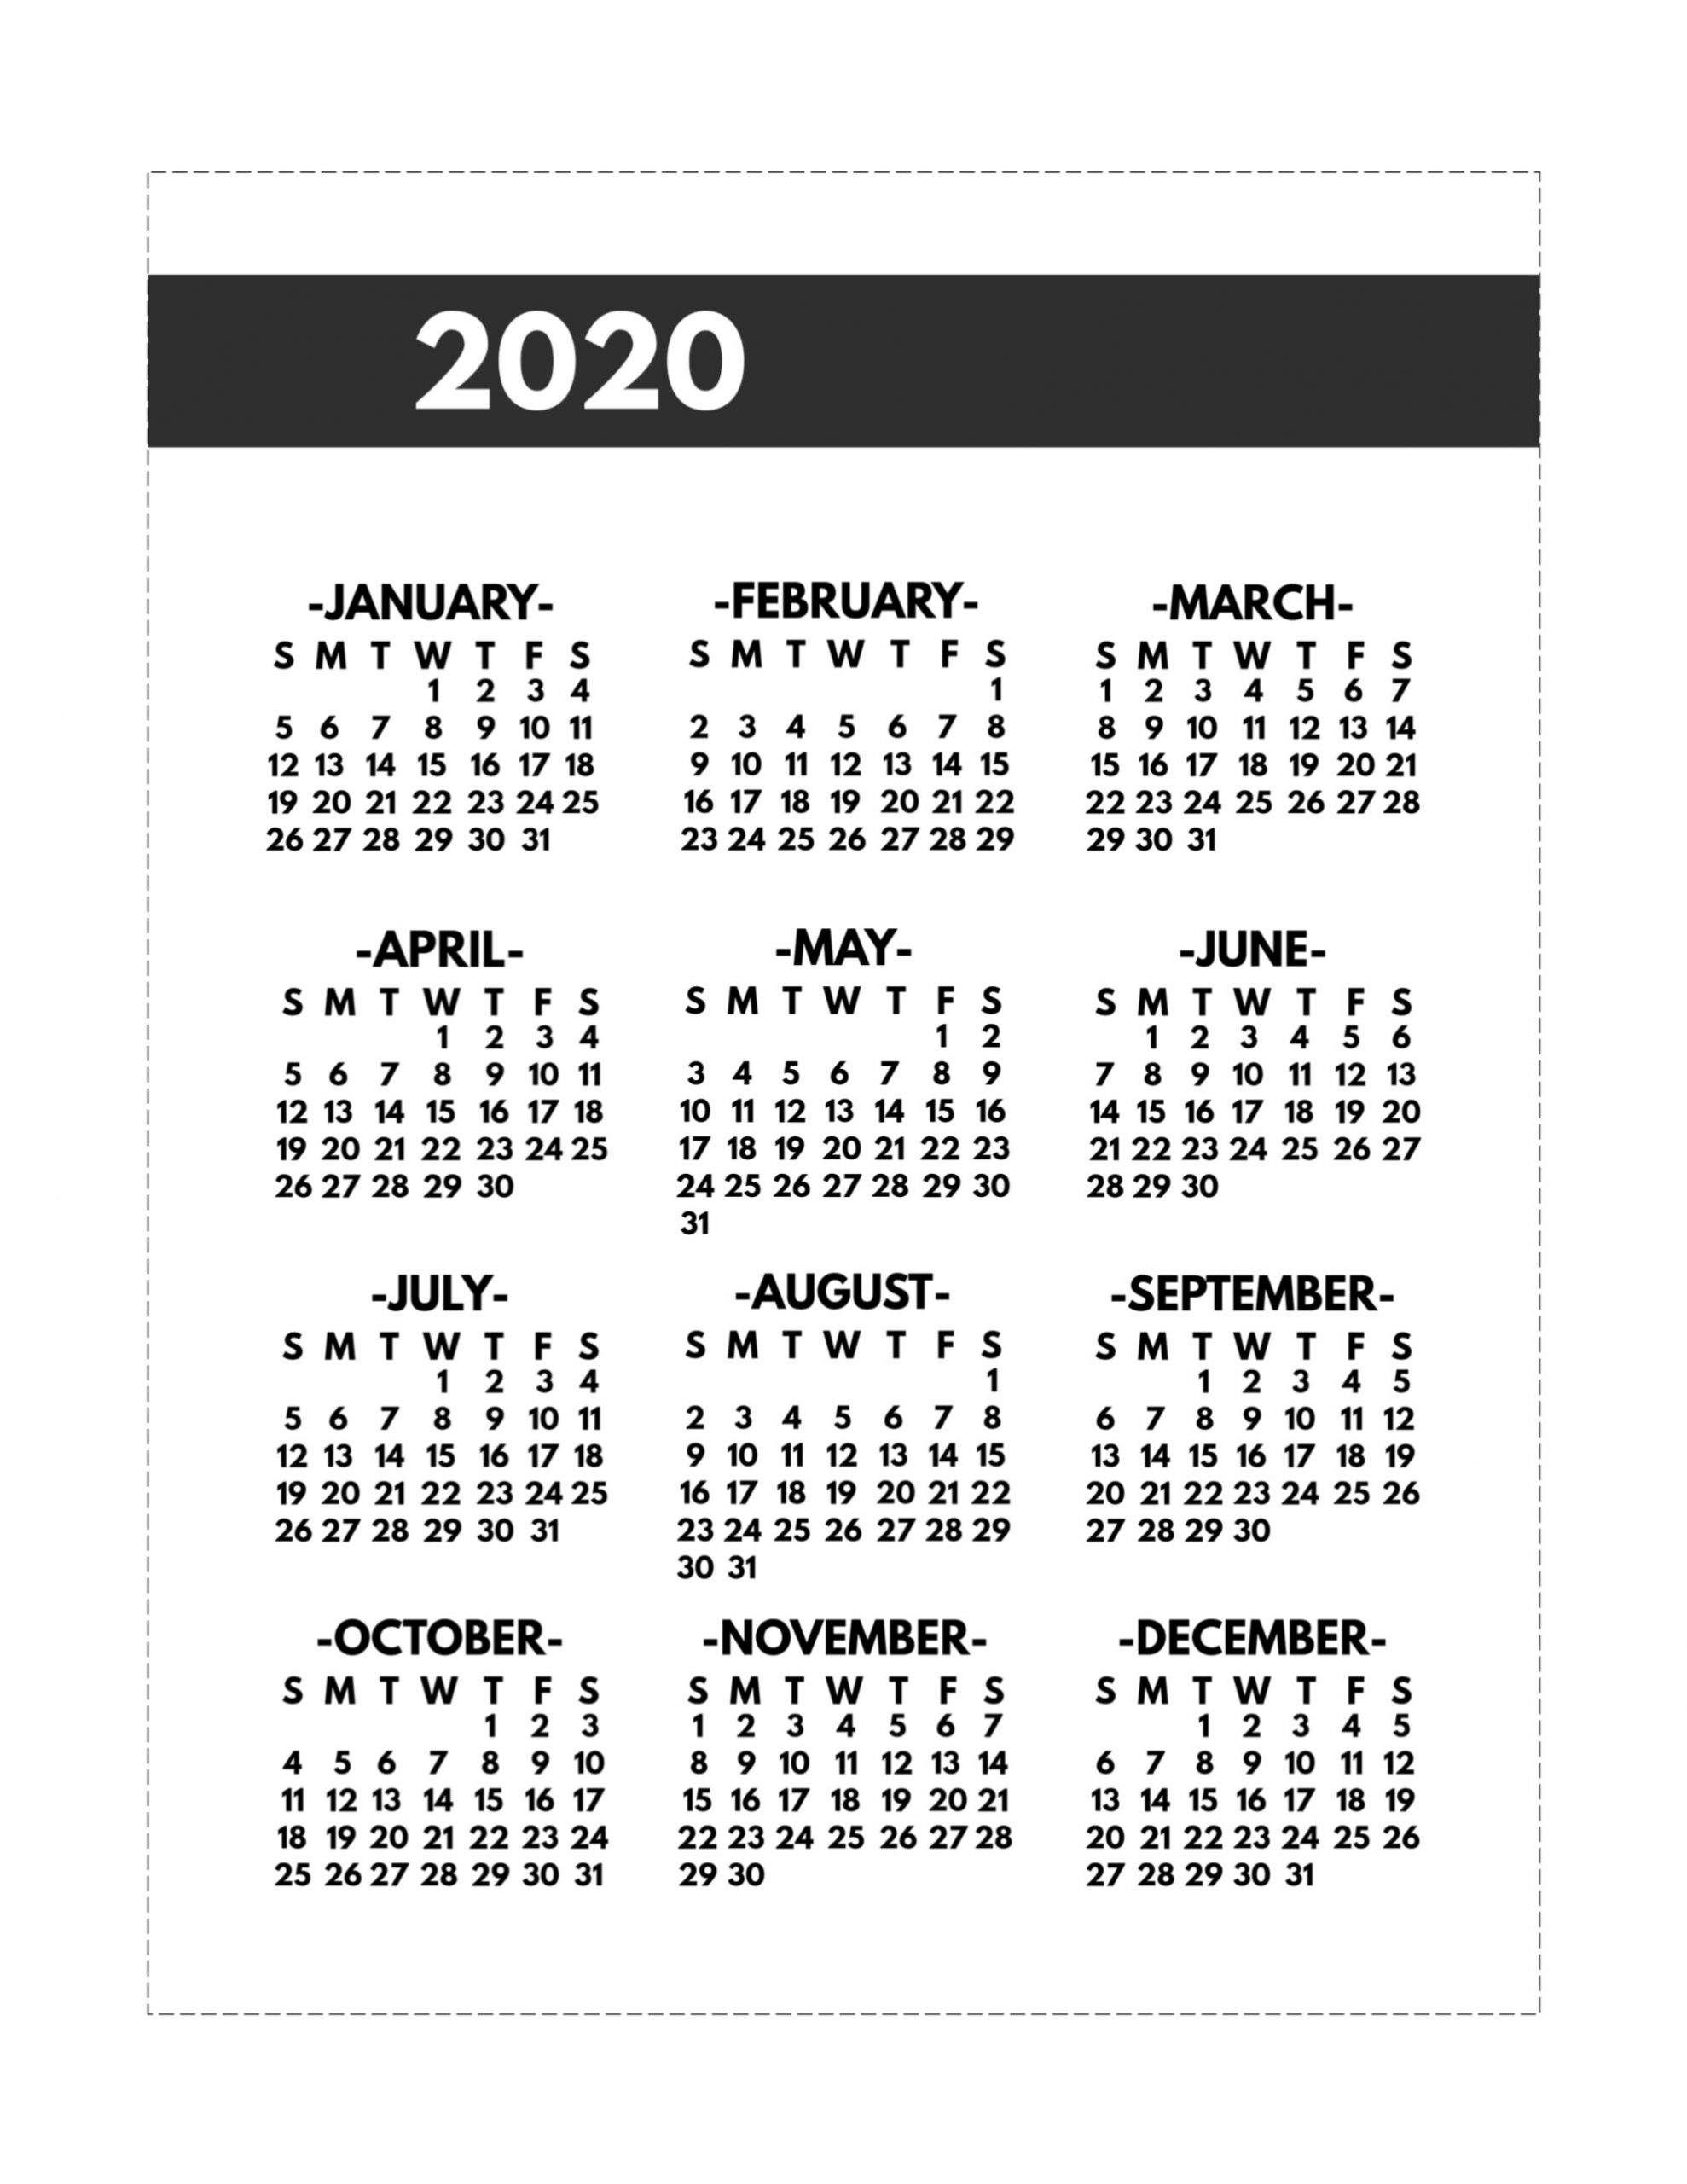 Free 8.5 X 11 Calendars - Calendar Inspiration Design pertaining to Year At A Glance Calendar 2020 8.5 X 11